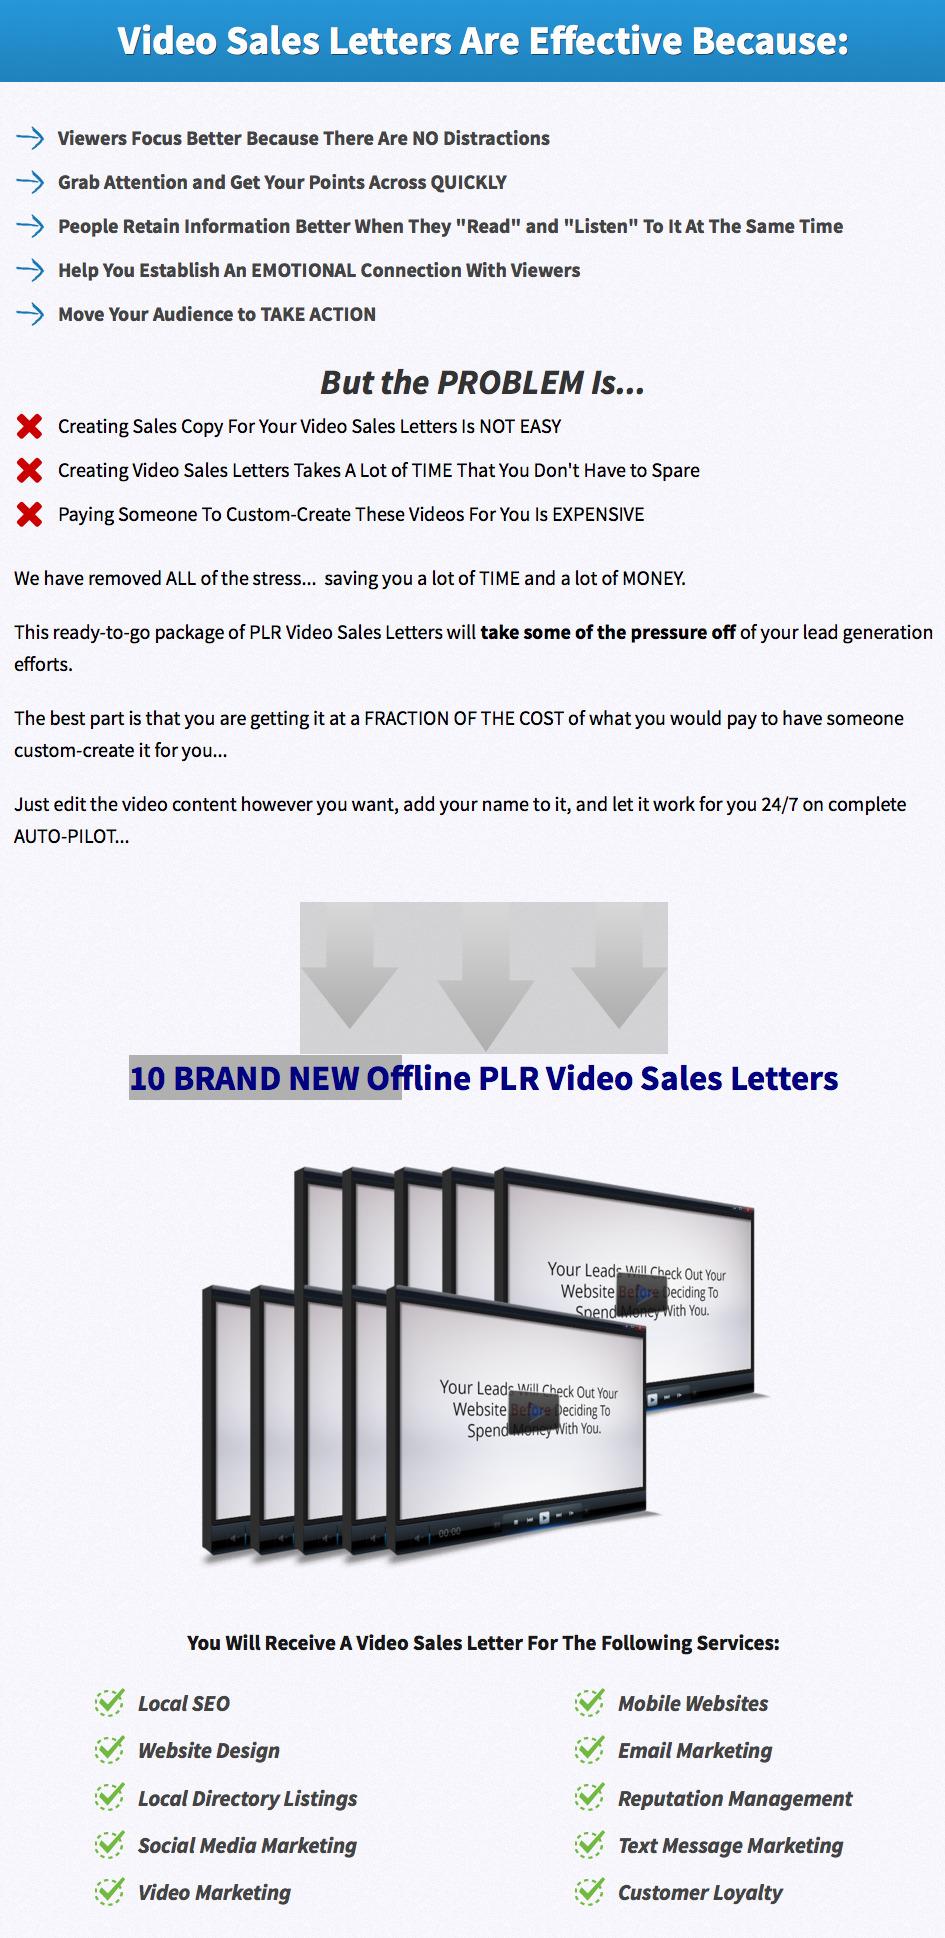 Offline Video Sales Letters PLR Pack